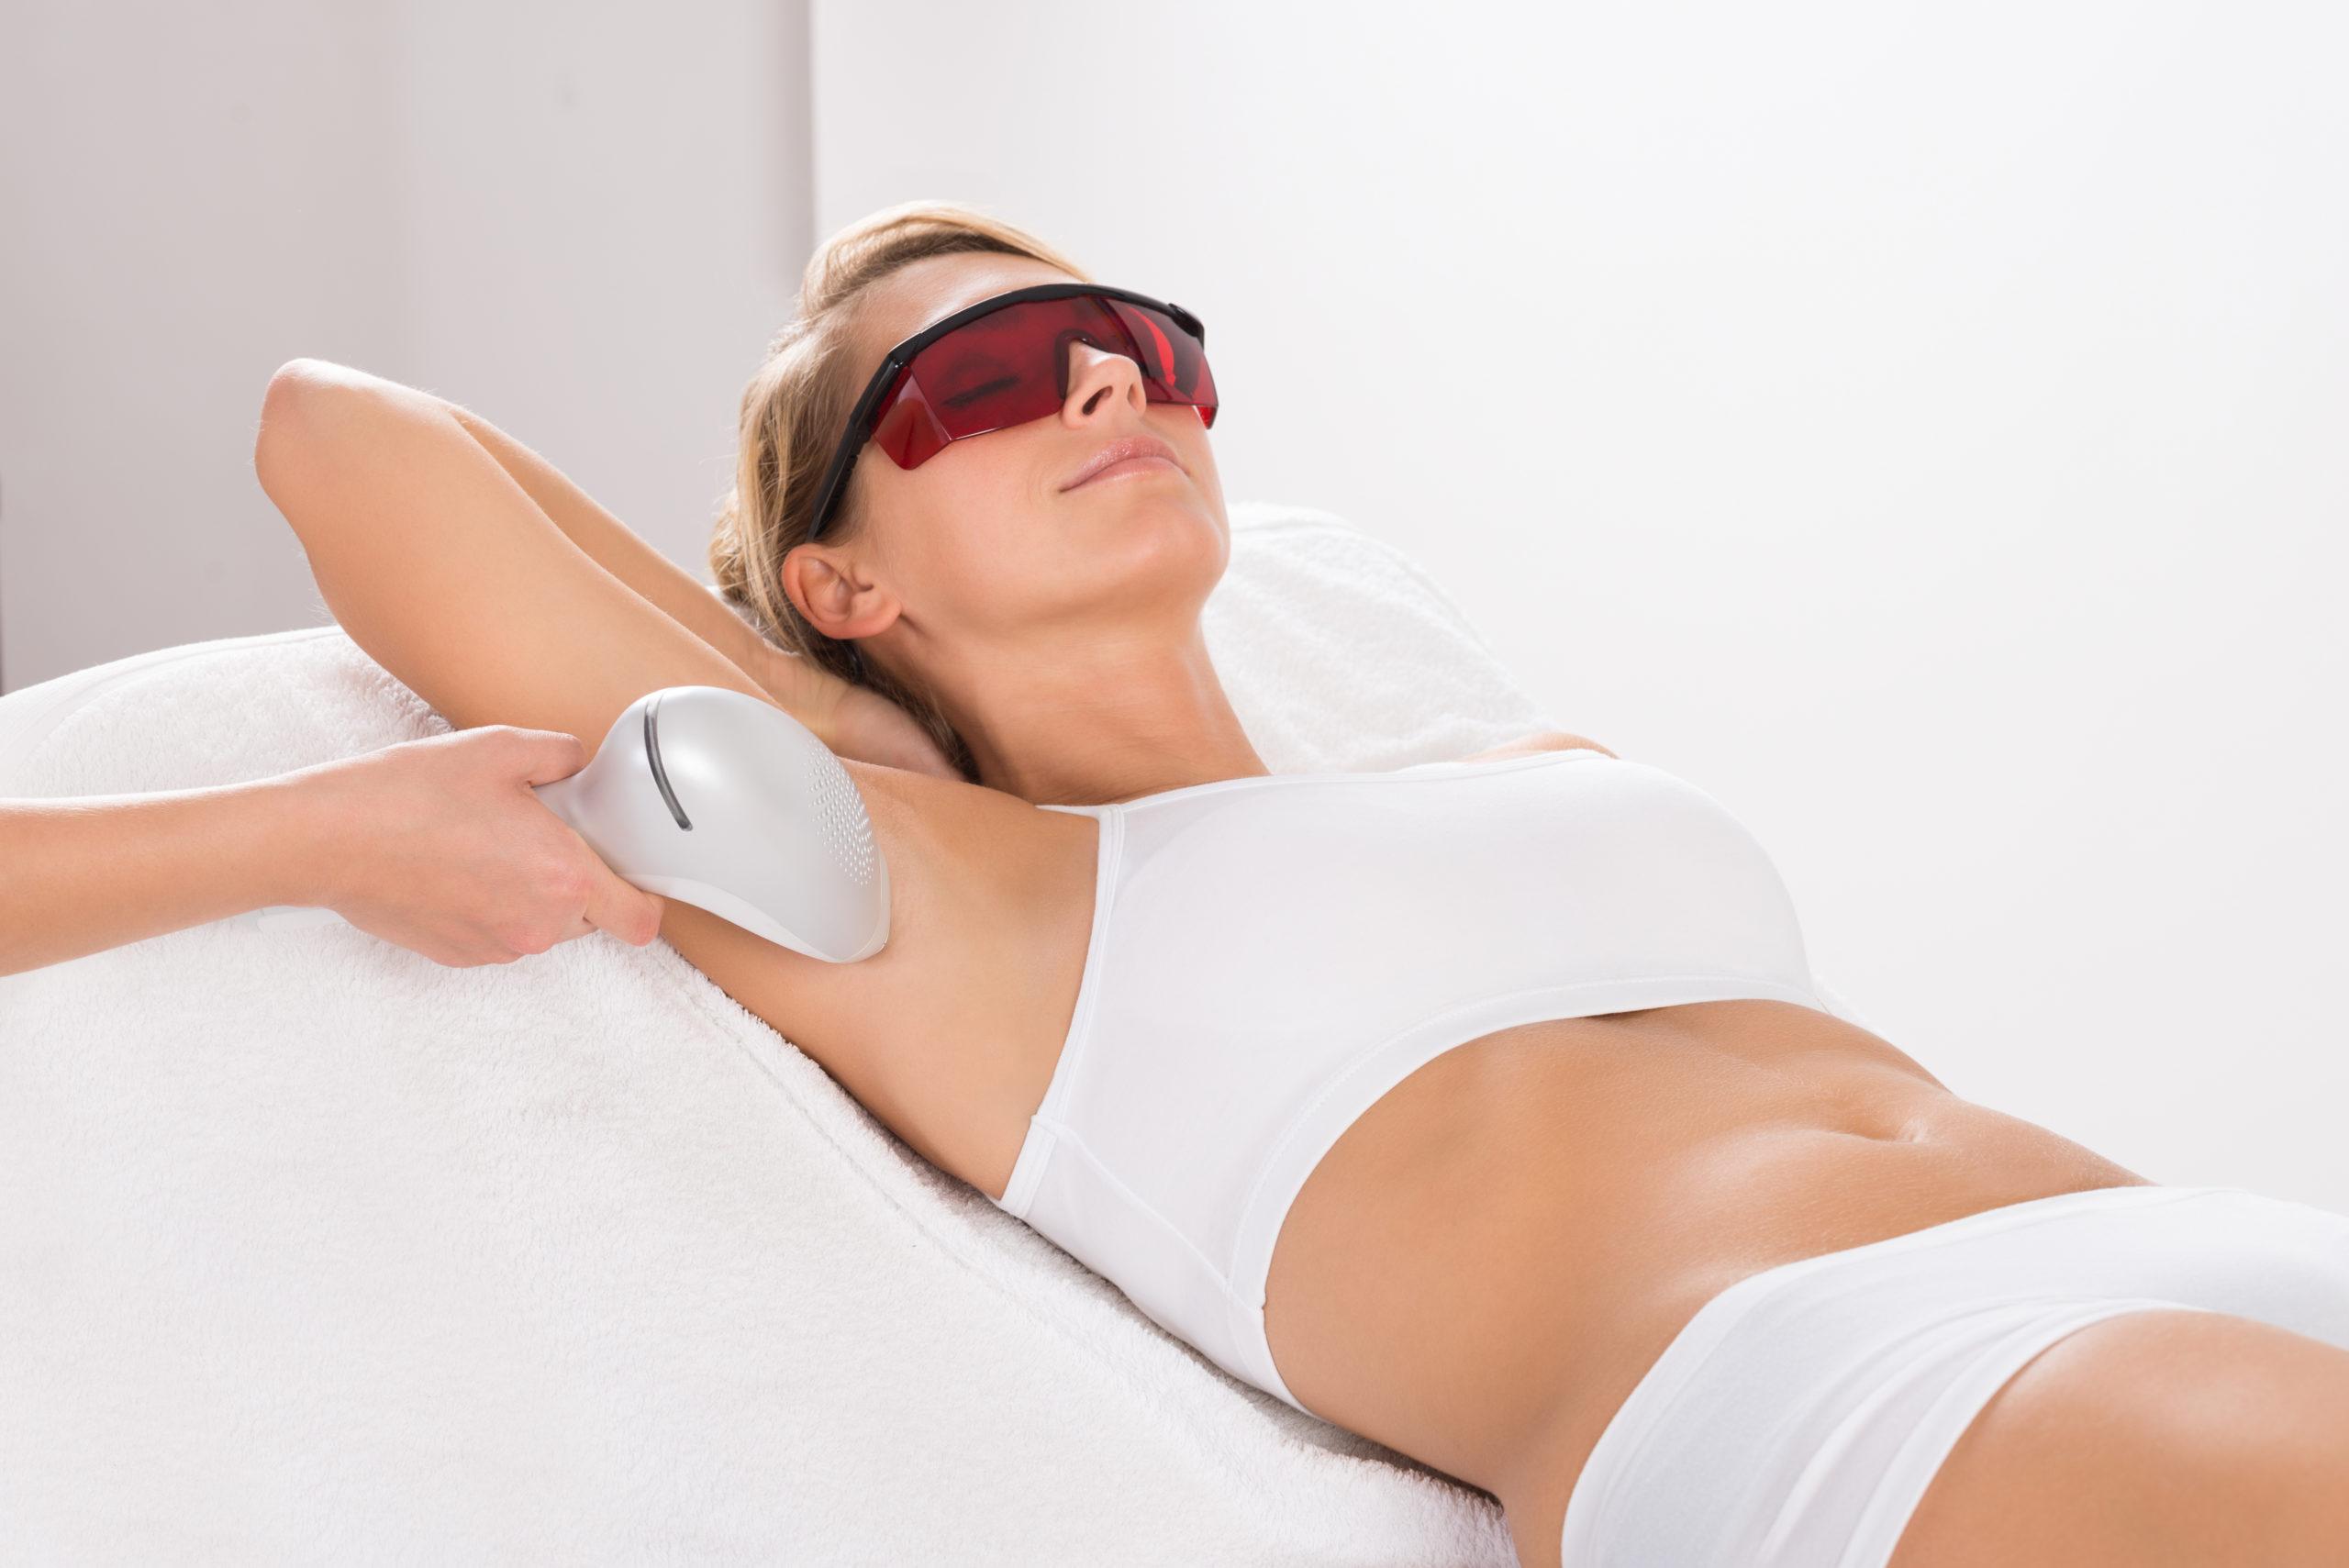 Laser Hair Removal - Underarms & Bikini